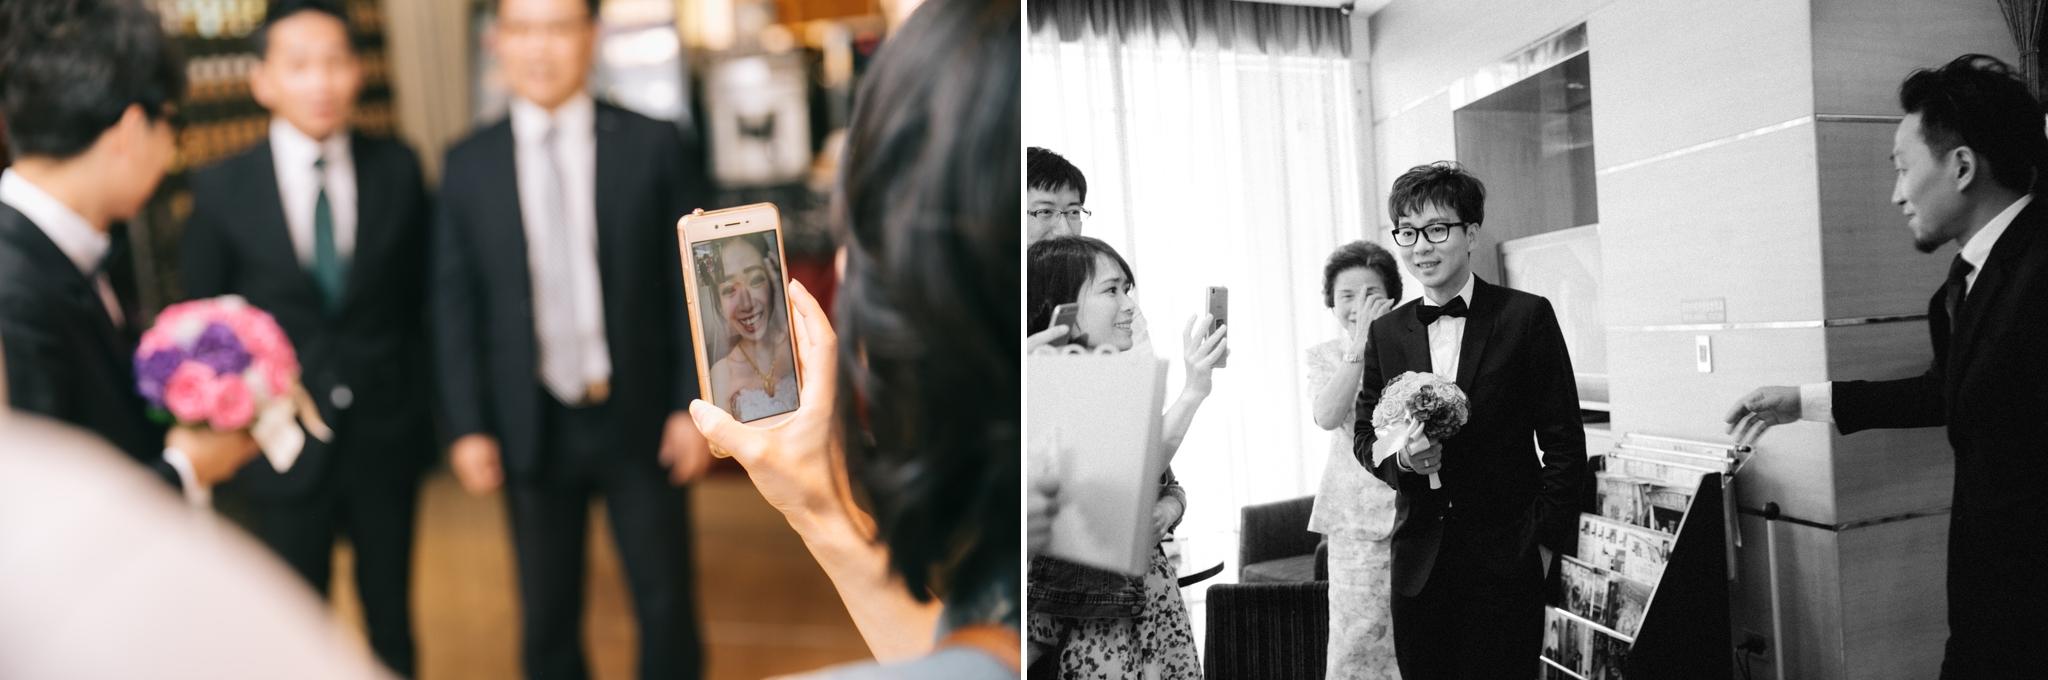 Tina+Nash-wedding-台北婚禮迎娶晚宴-新莊終身大事-029.jpg